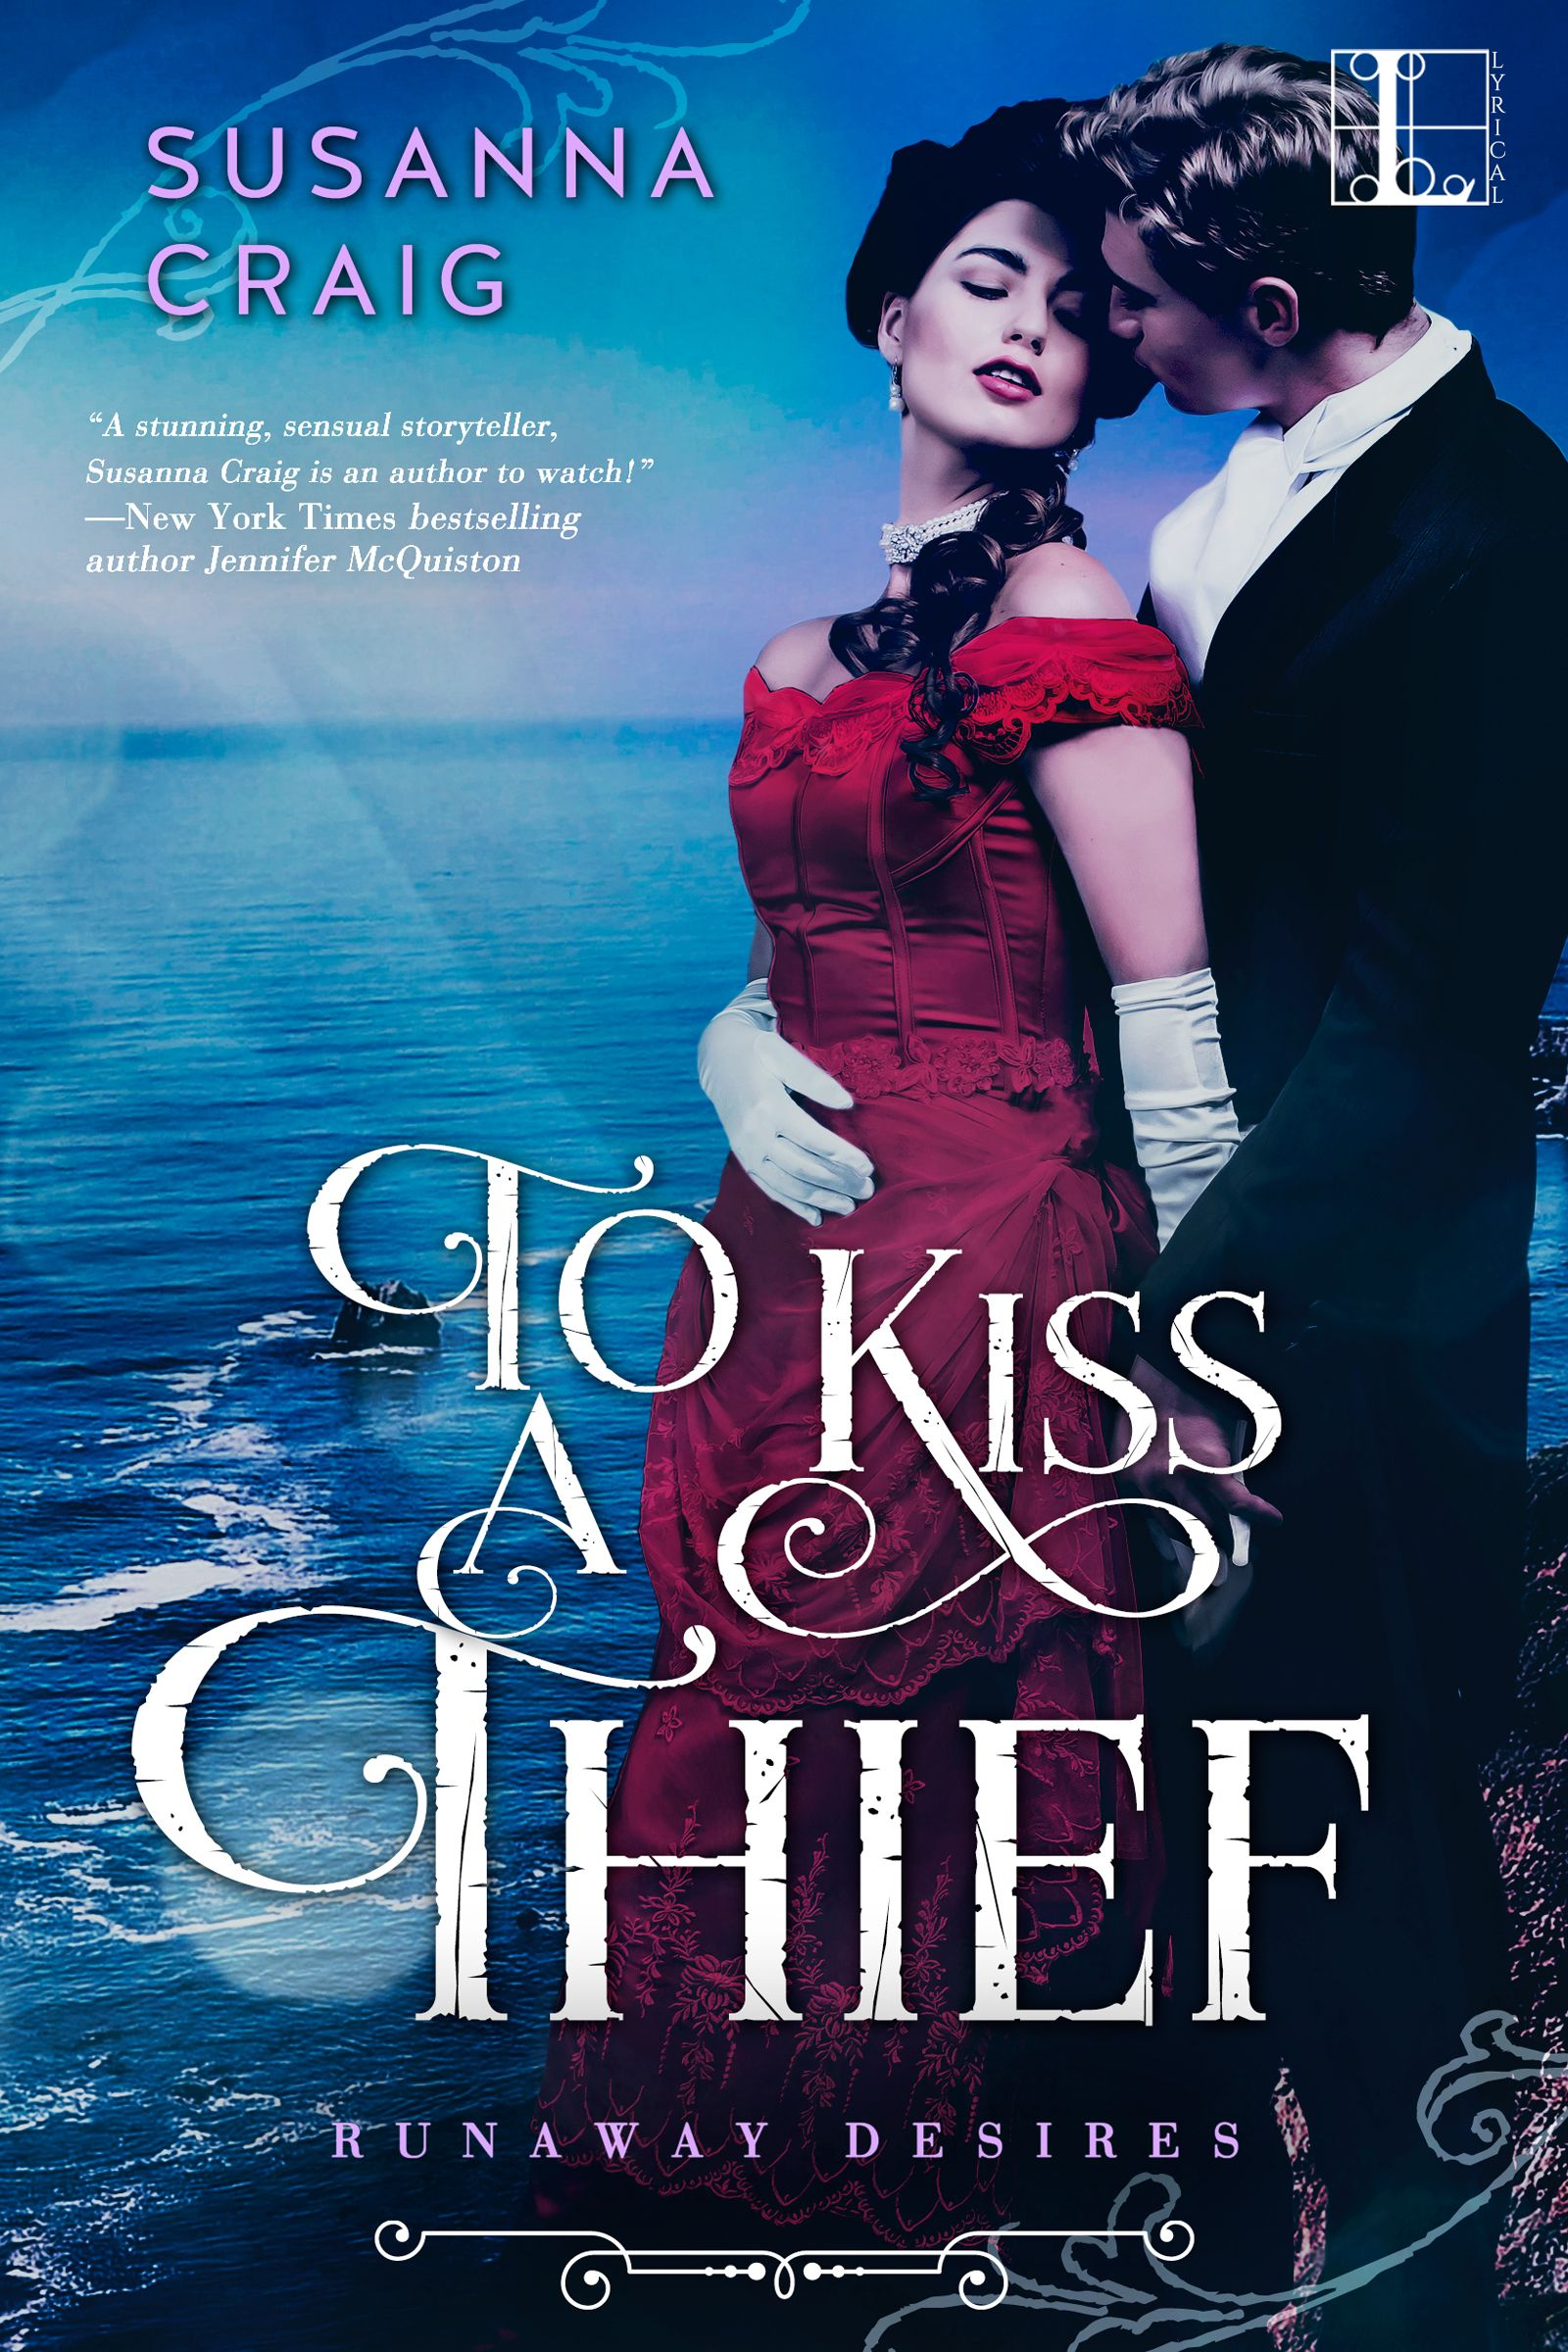 Susanna Craig - To Kiss a Thief / #awordfromJoJo #HistoricalRomance #SusannaCraig